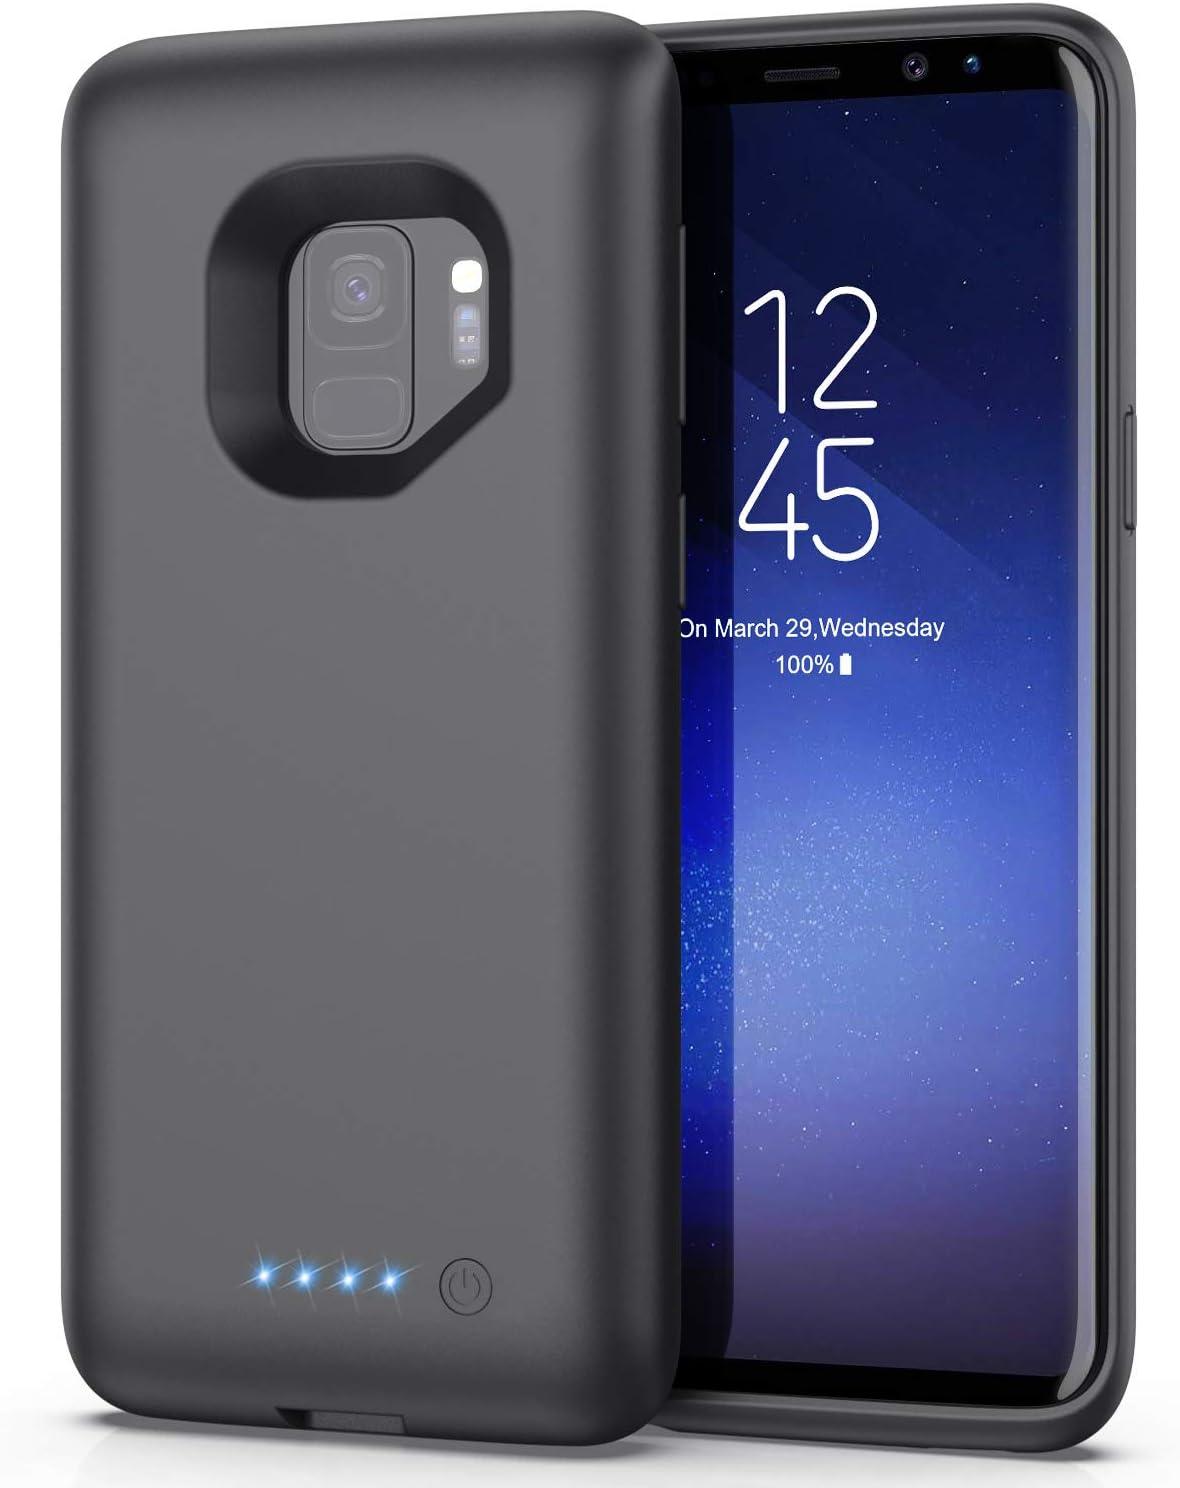 Trswyop Funda Batería para Samsung Galaxy S9, 6000mAh Funda Cargador Portatil Carga Rapida Carcasa Batería Recargable Batería Externa para S9 [5,8 Pulgadas]